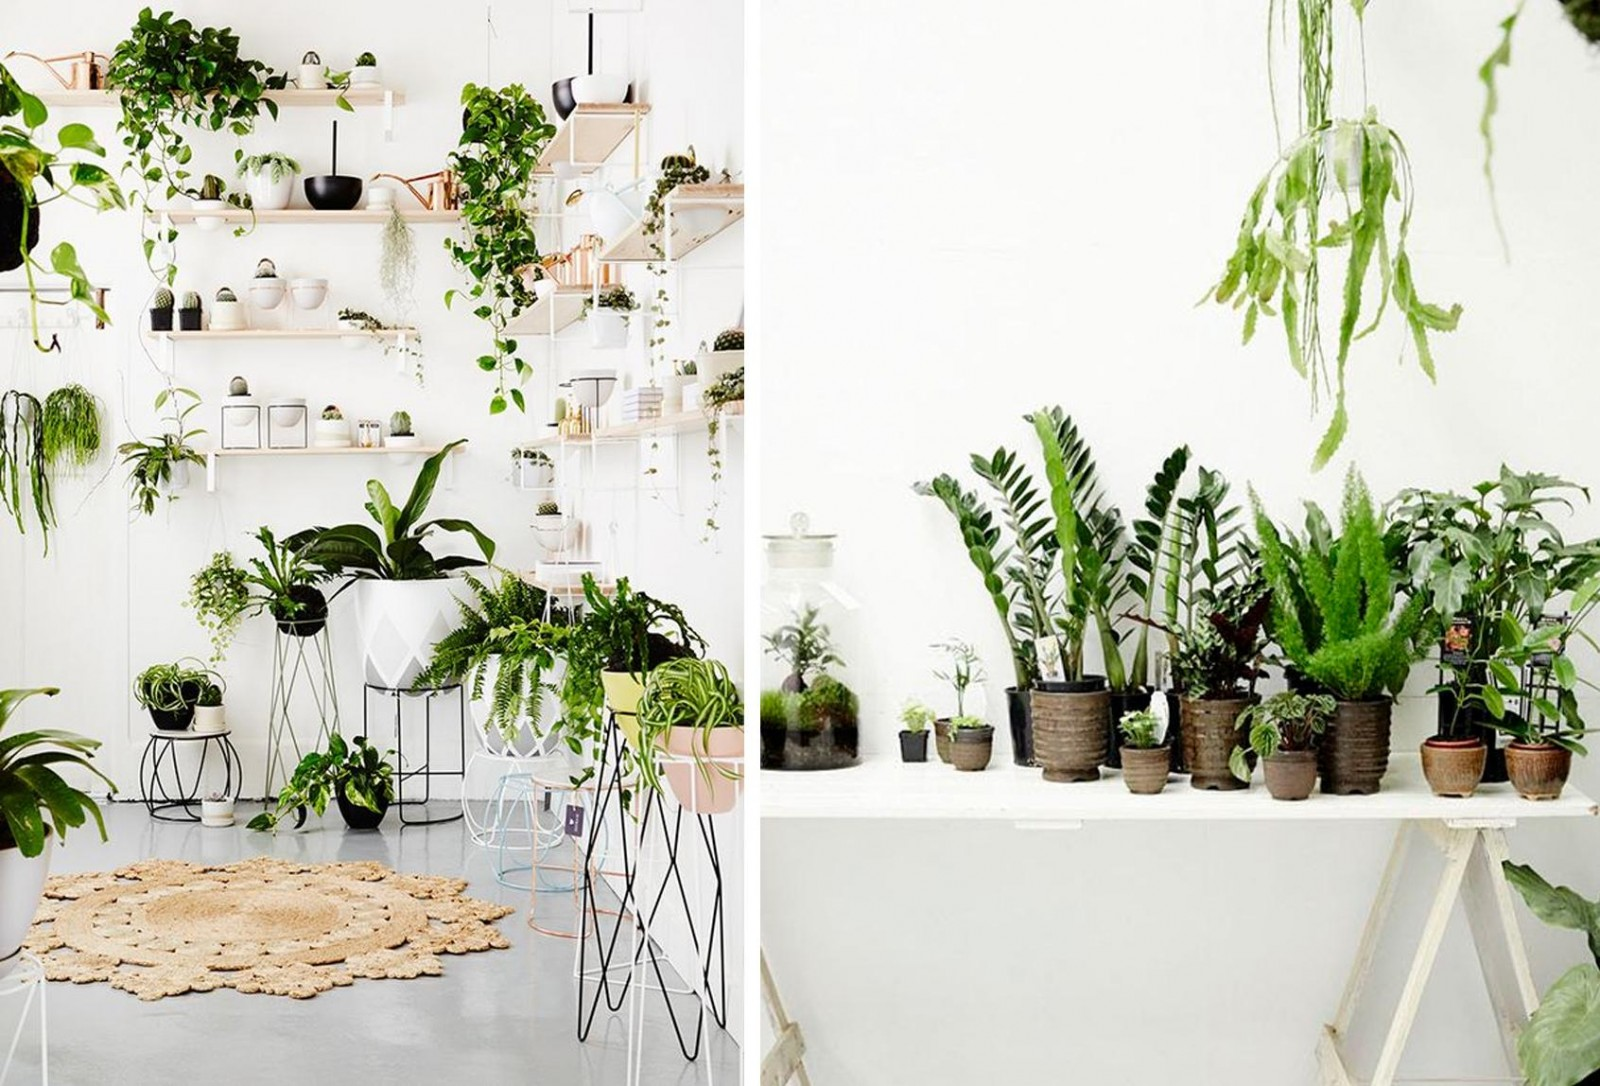 Jungle in huis interieur streept